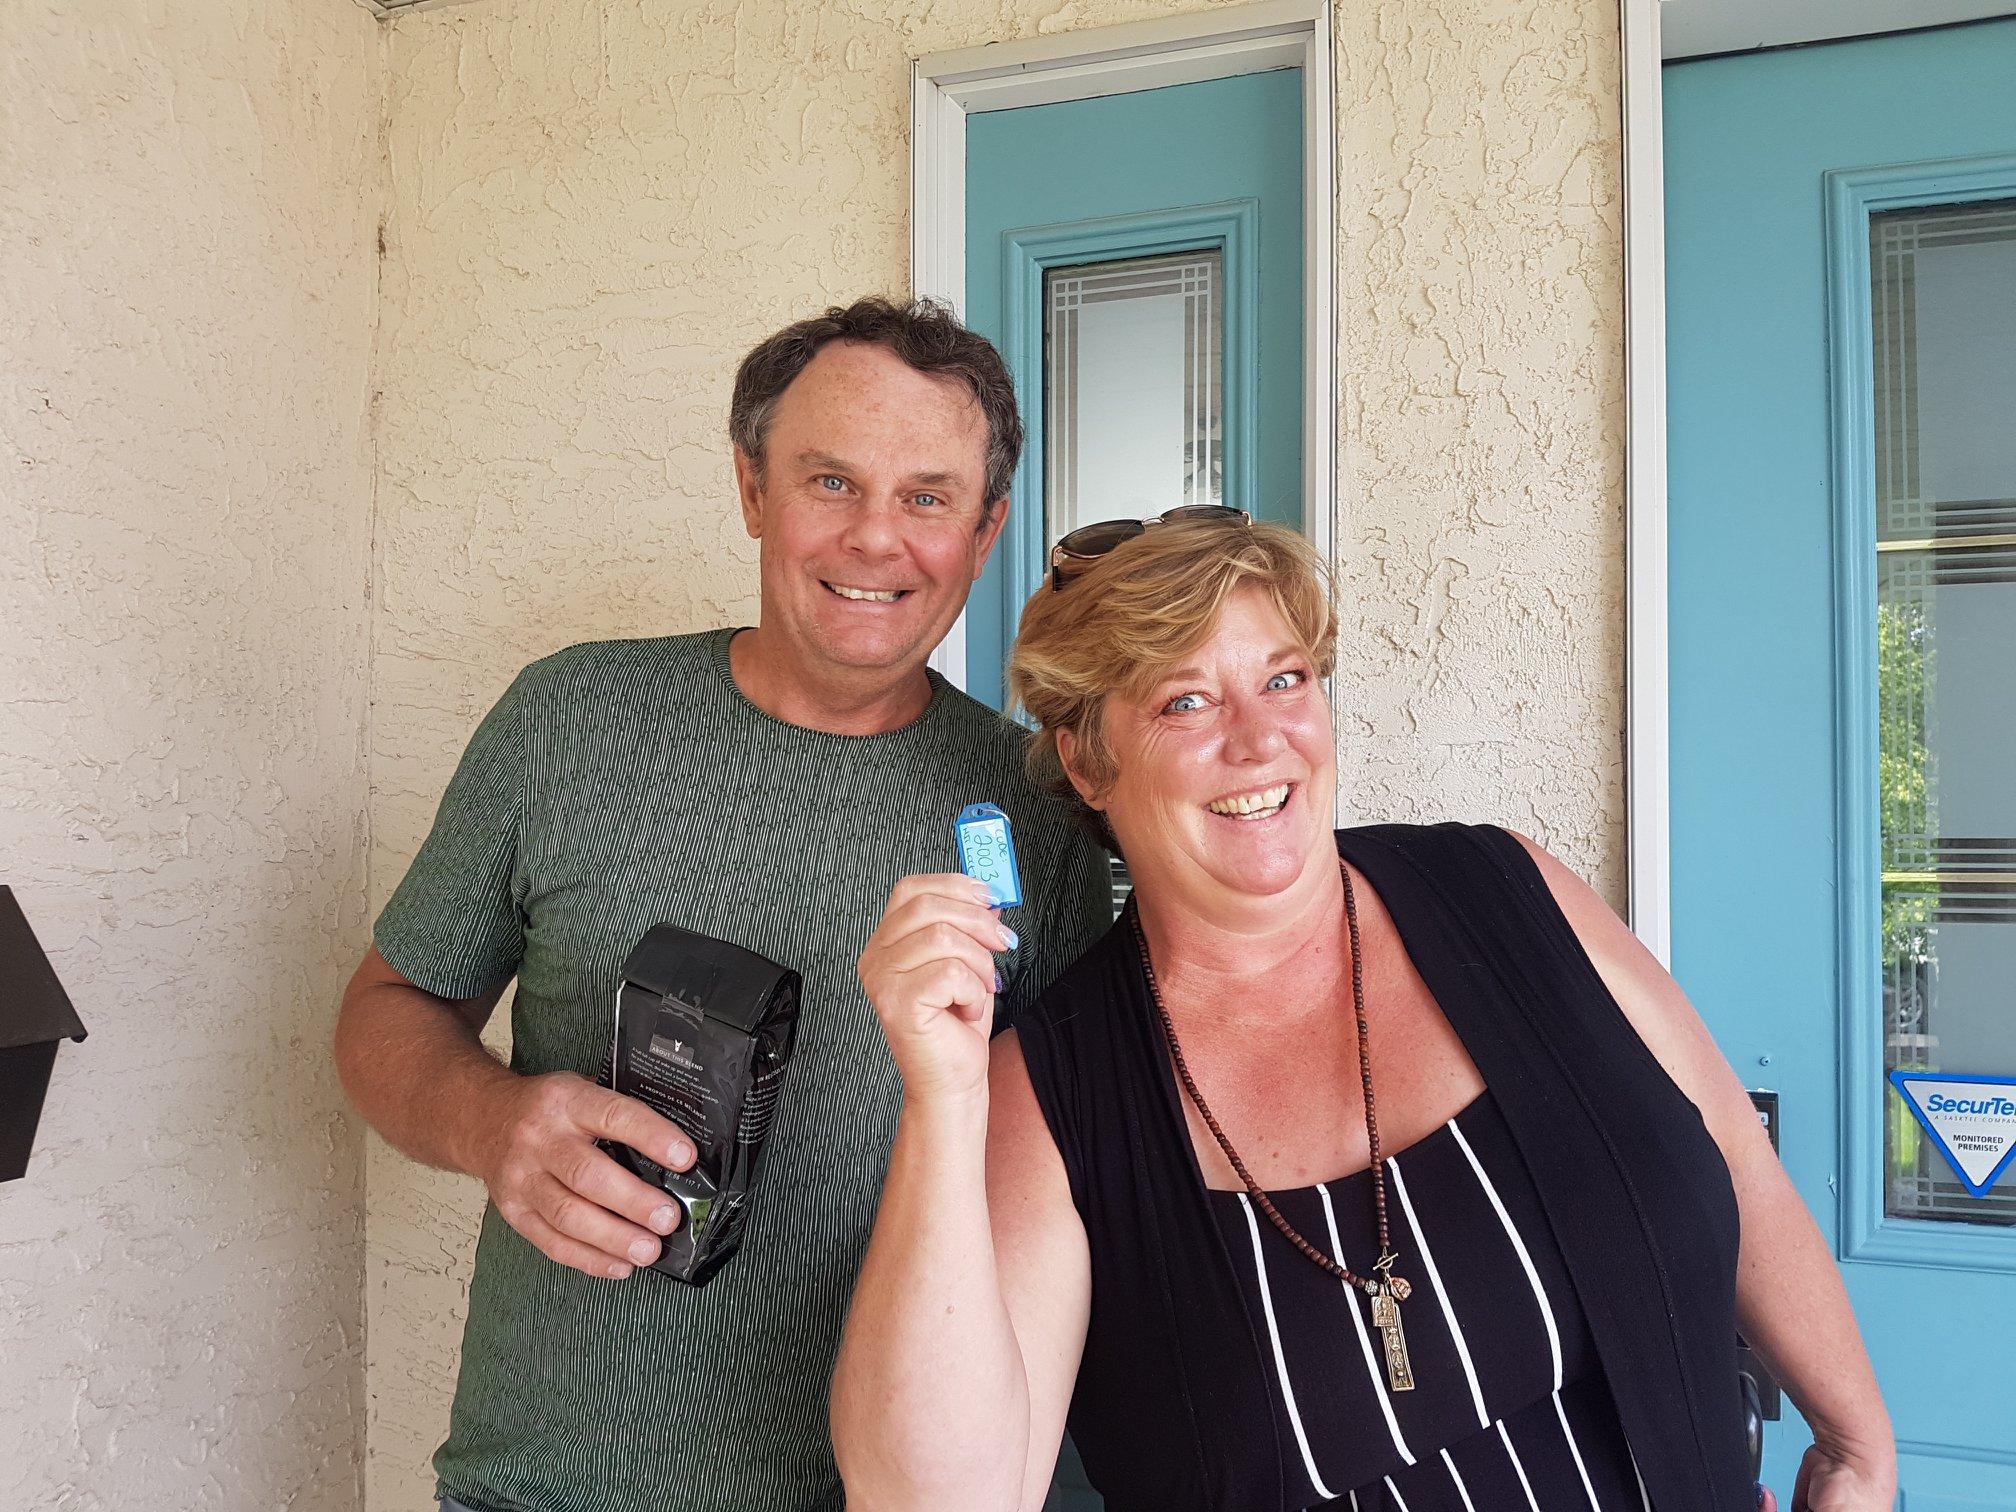 Les & Deanne